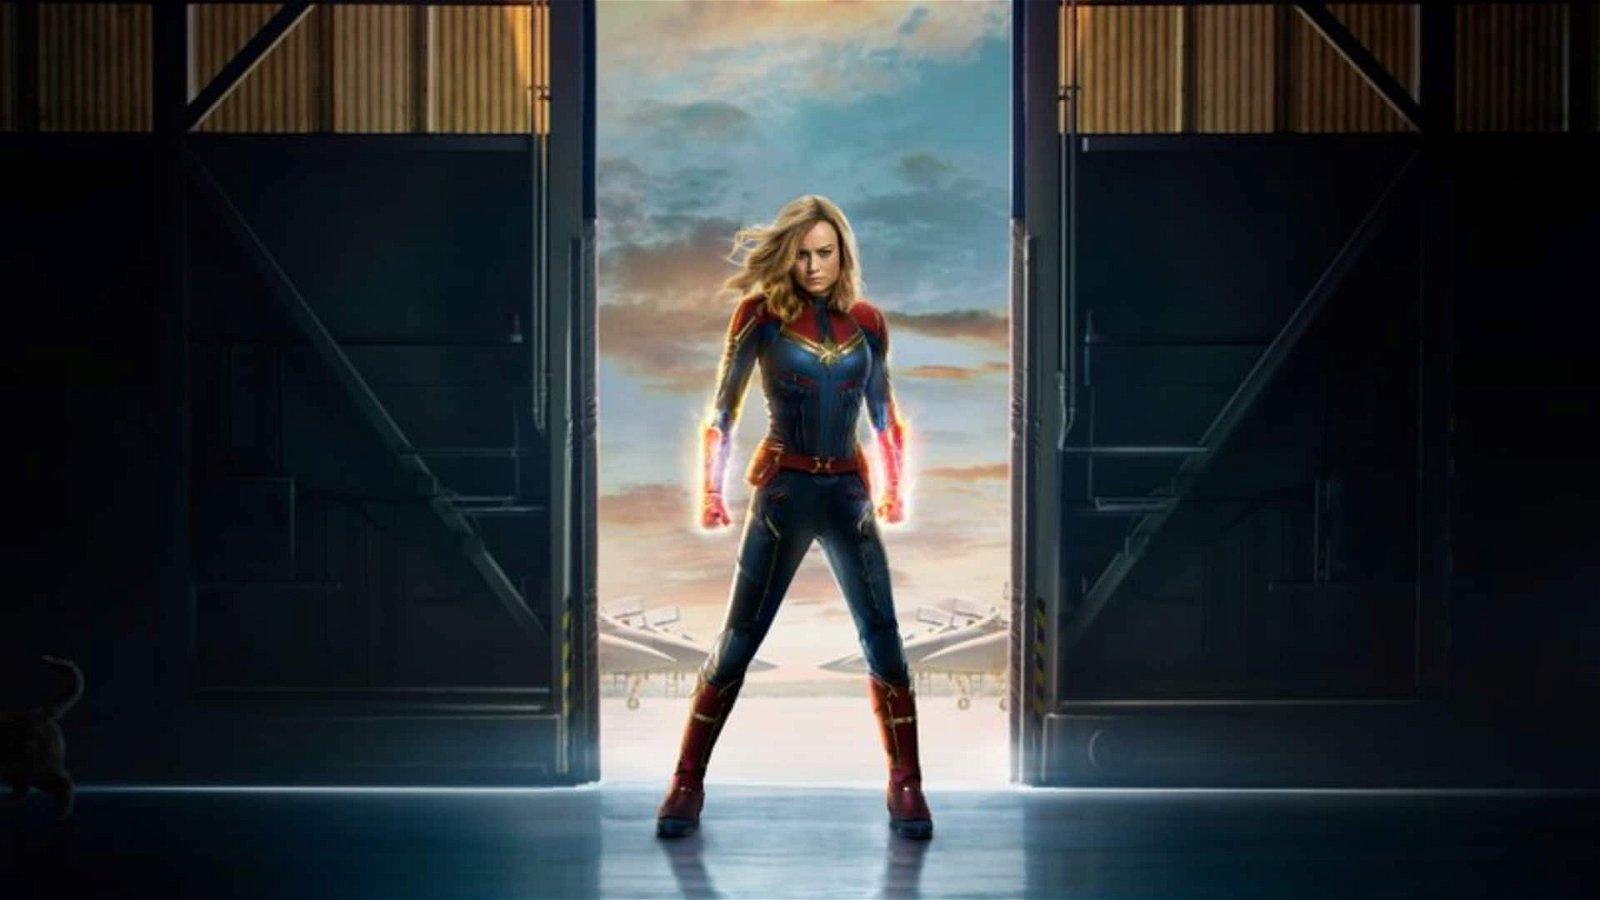 Brie Larson Soars in Captain Marvel Trailer 2